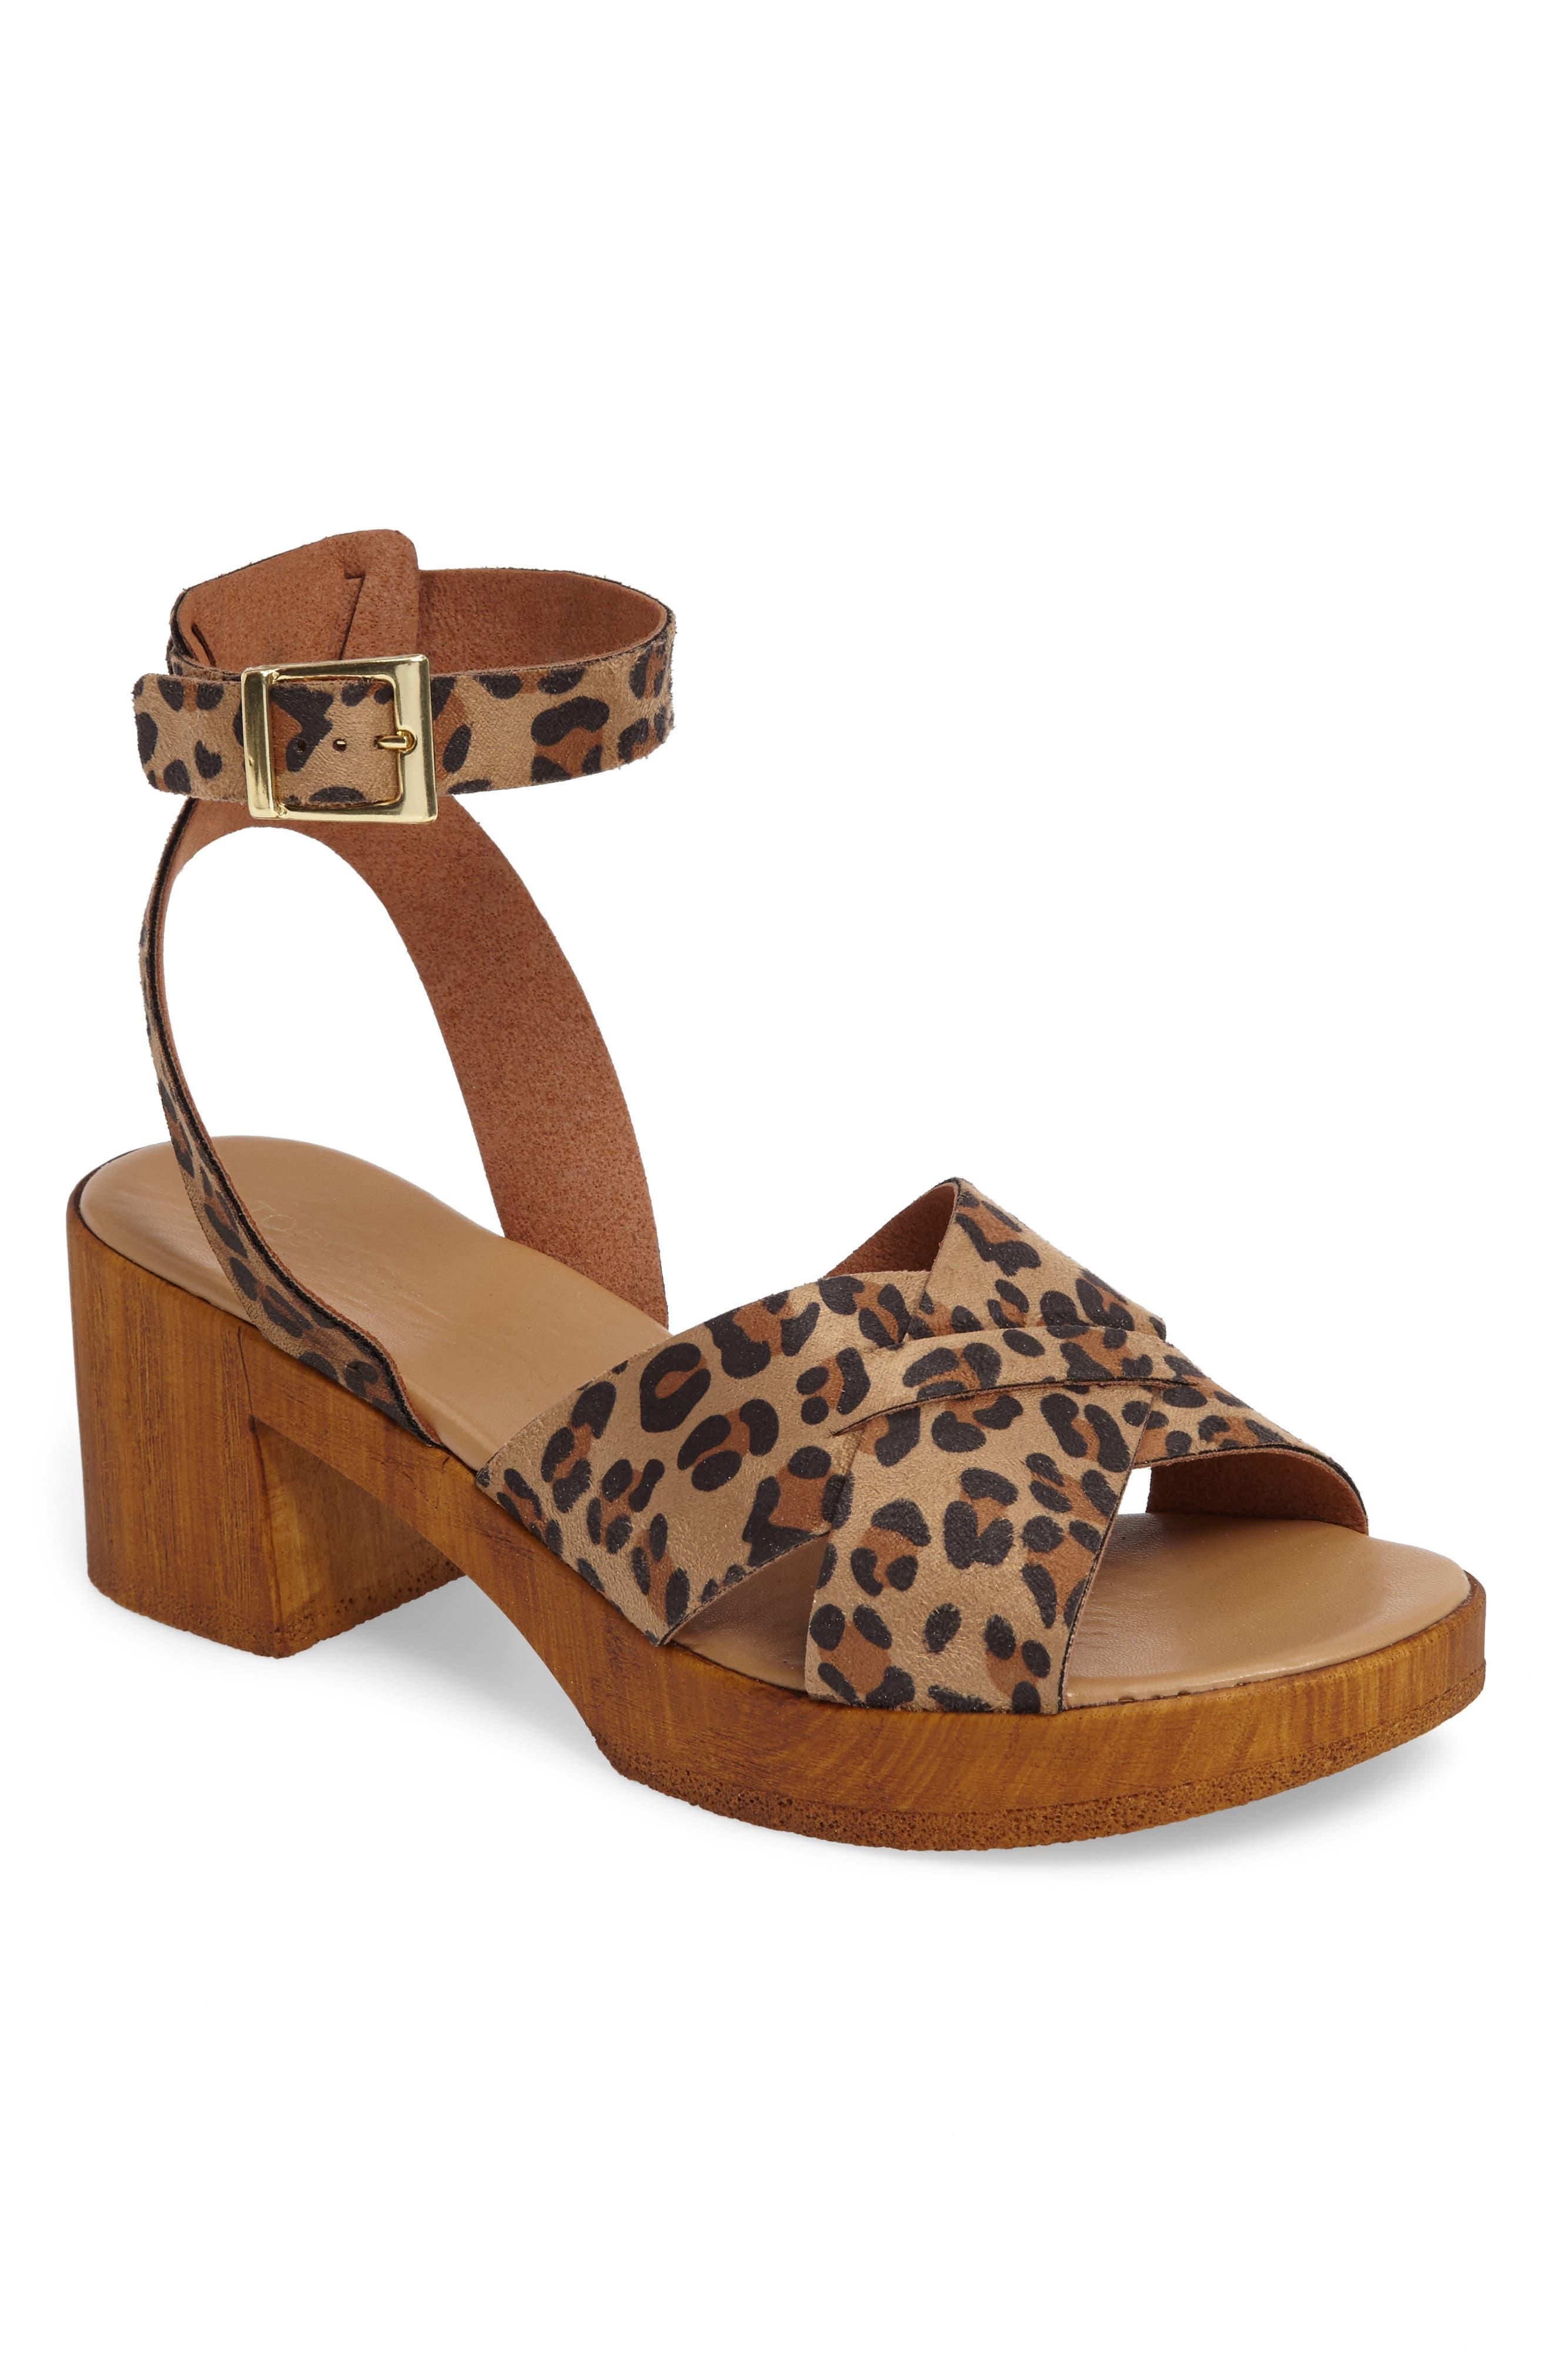 Main Image - Topshop Dolly Block Heel Sandal (Women)